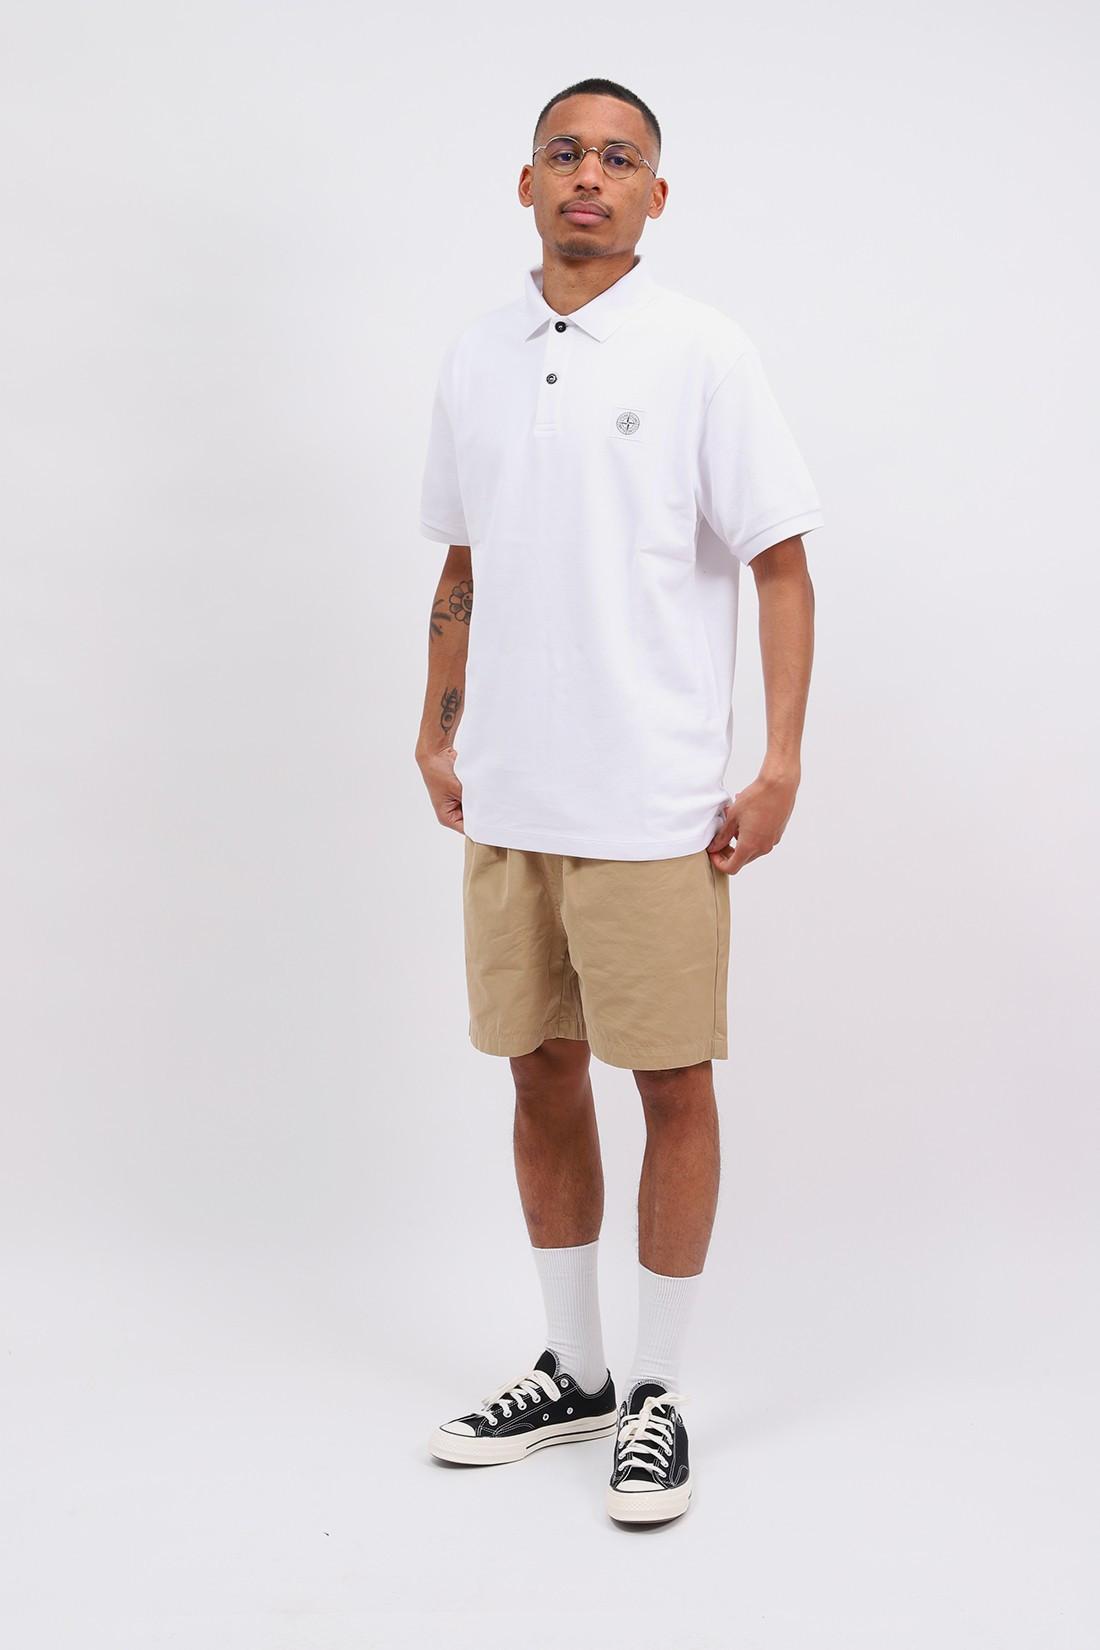 STONE ISLAND / 22r39 polo shirt v0001 Bianco